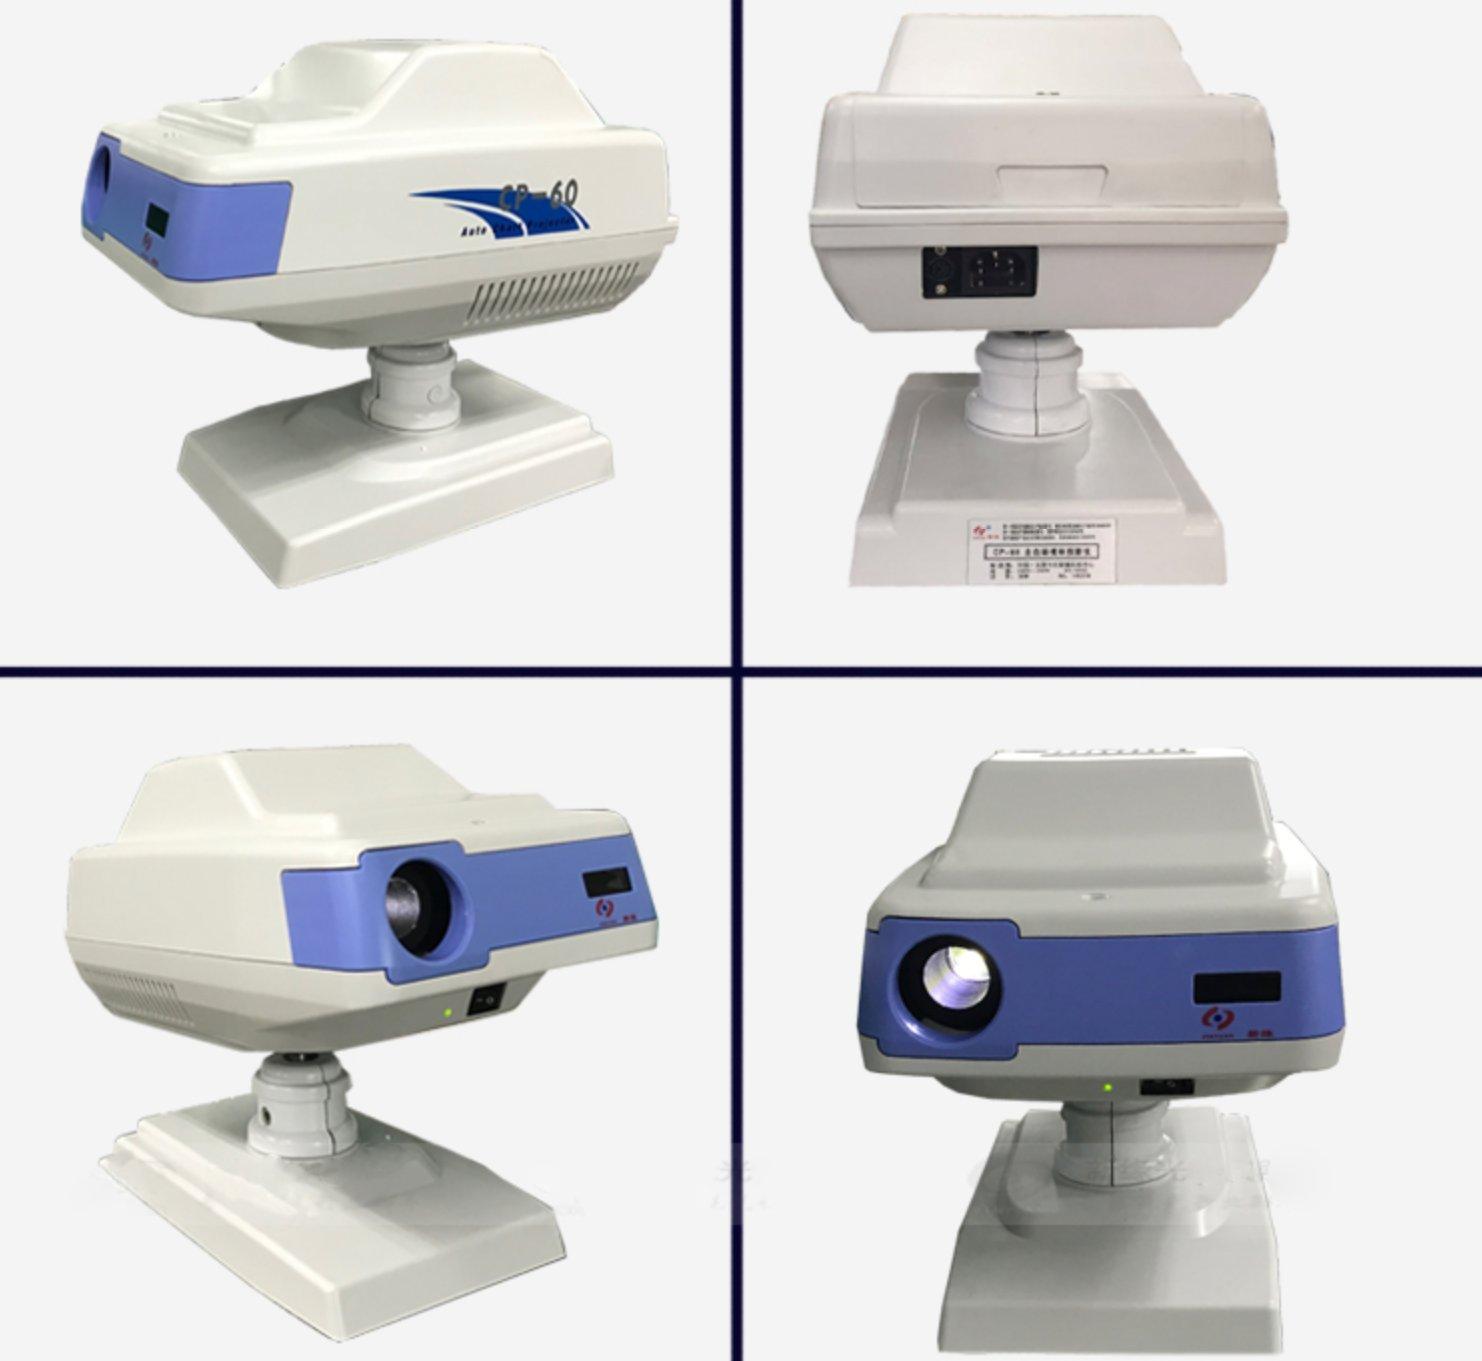 Durable LED Auto Chart Projector Optical Eye Vision Chart Projector 39 Charts Options Registered in FDA